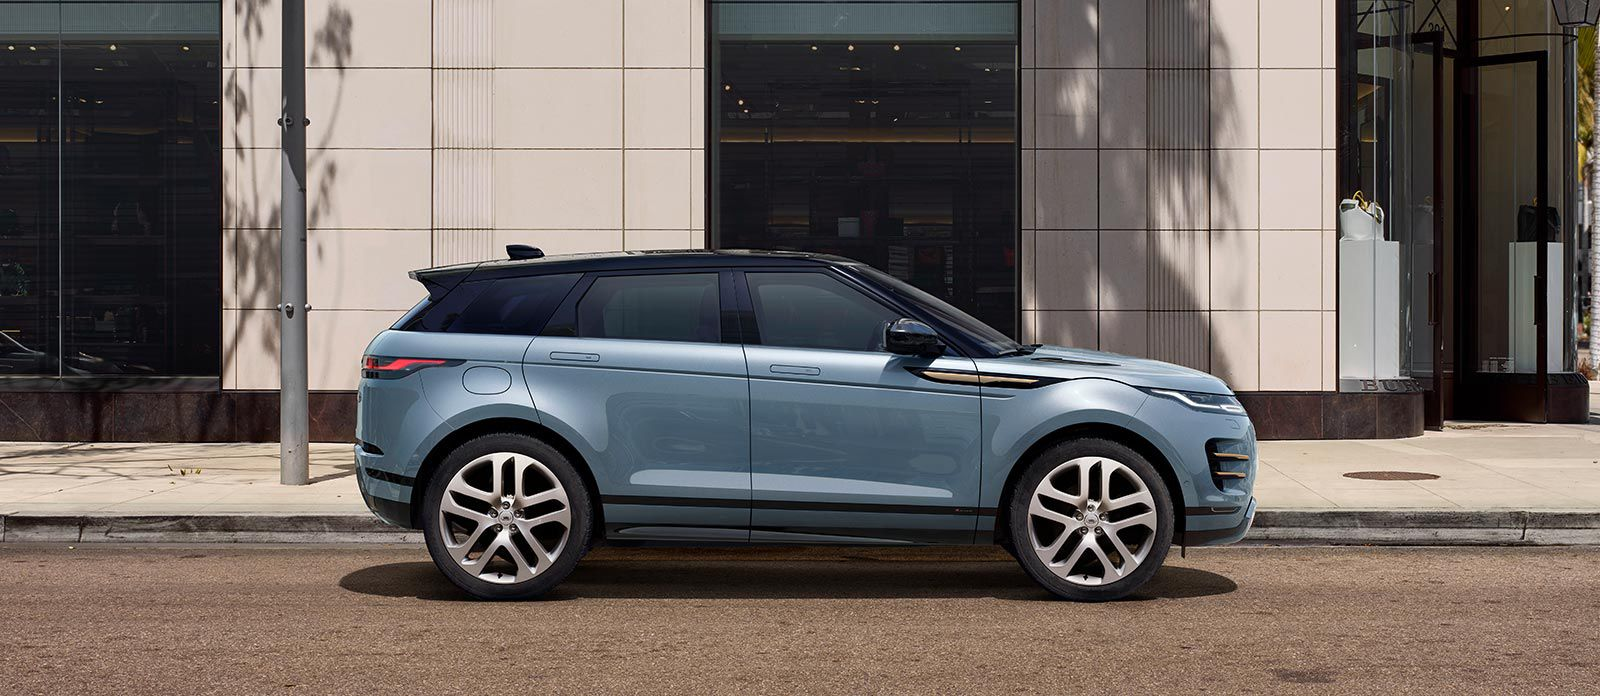 Customize, Build & Price | Land Rover Kuwait